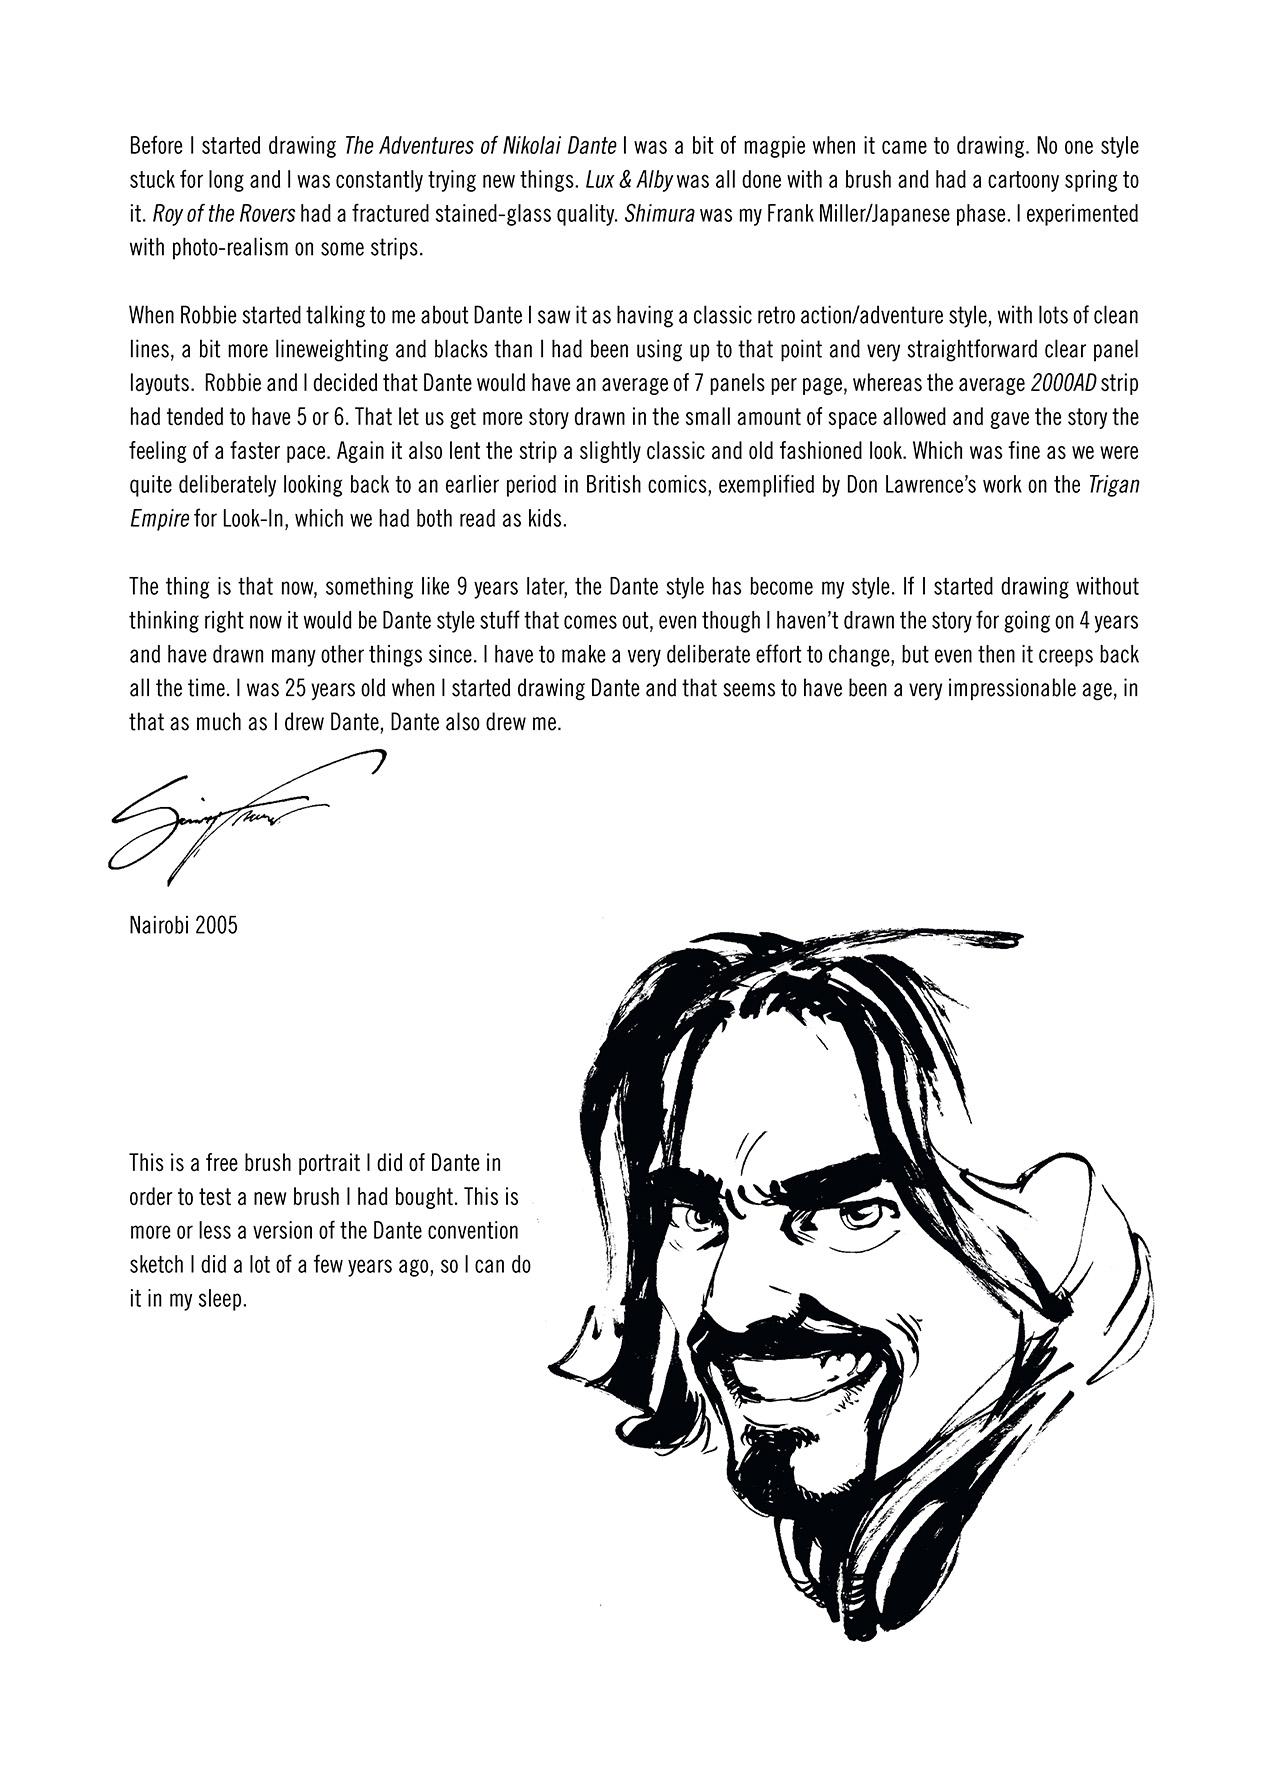 Read online Nikolai Dante comic -  Issue # TPB 3 - 139